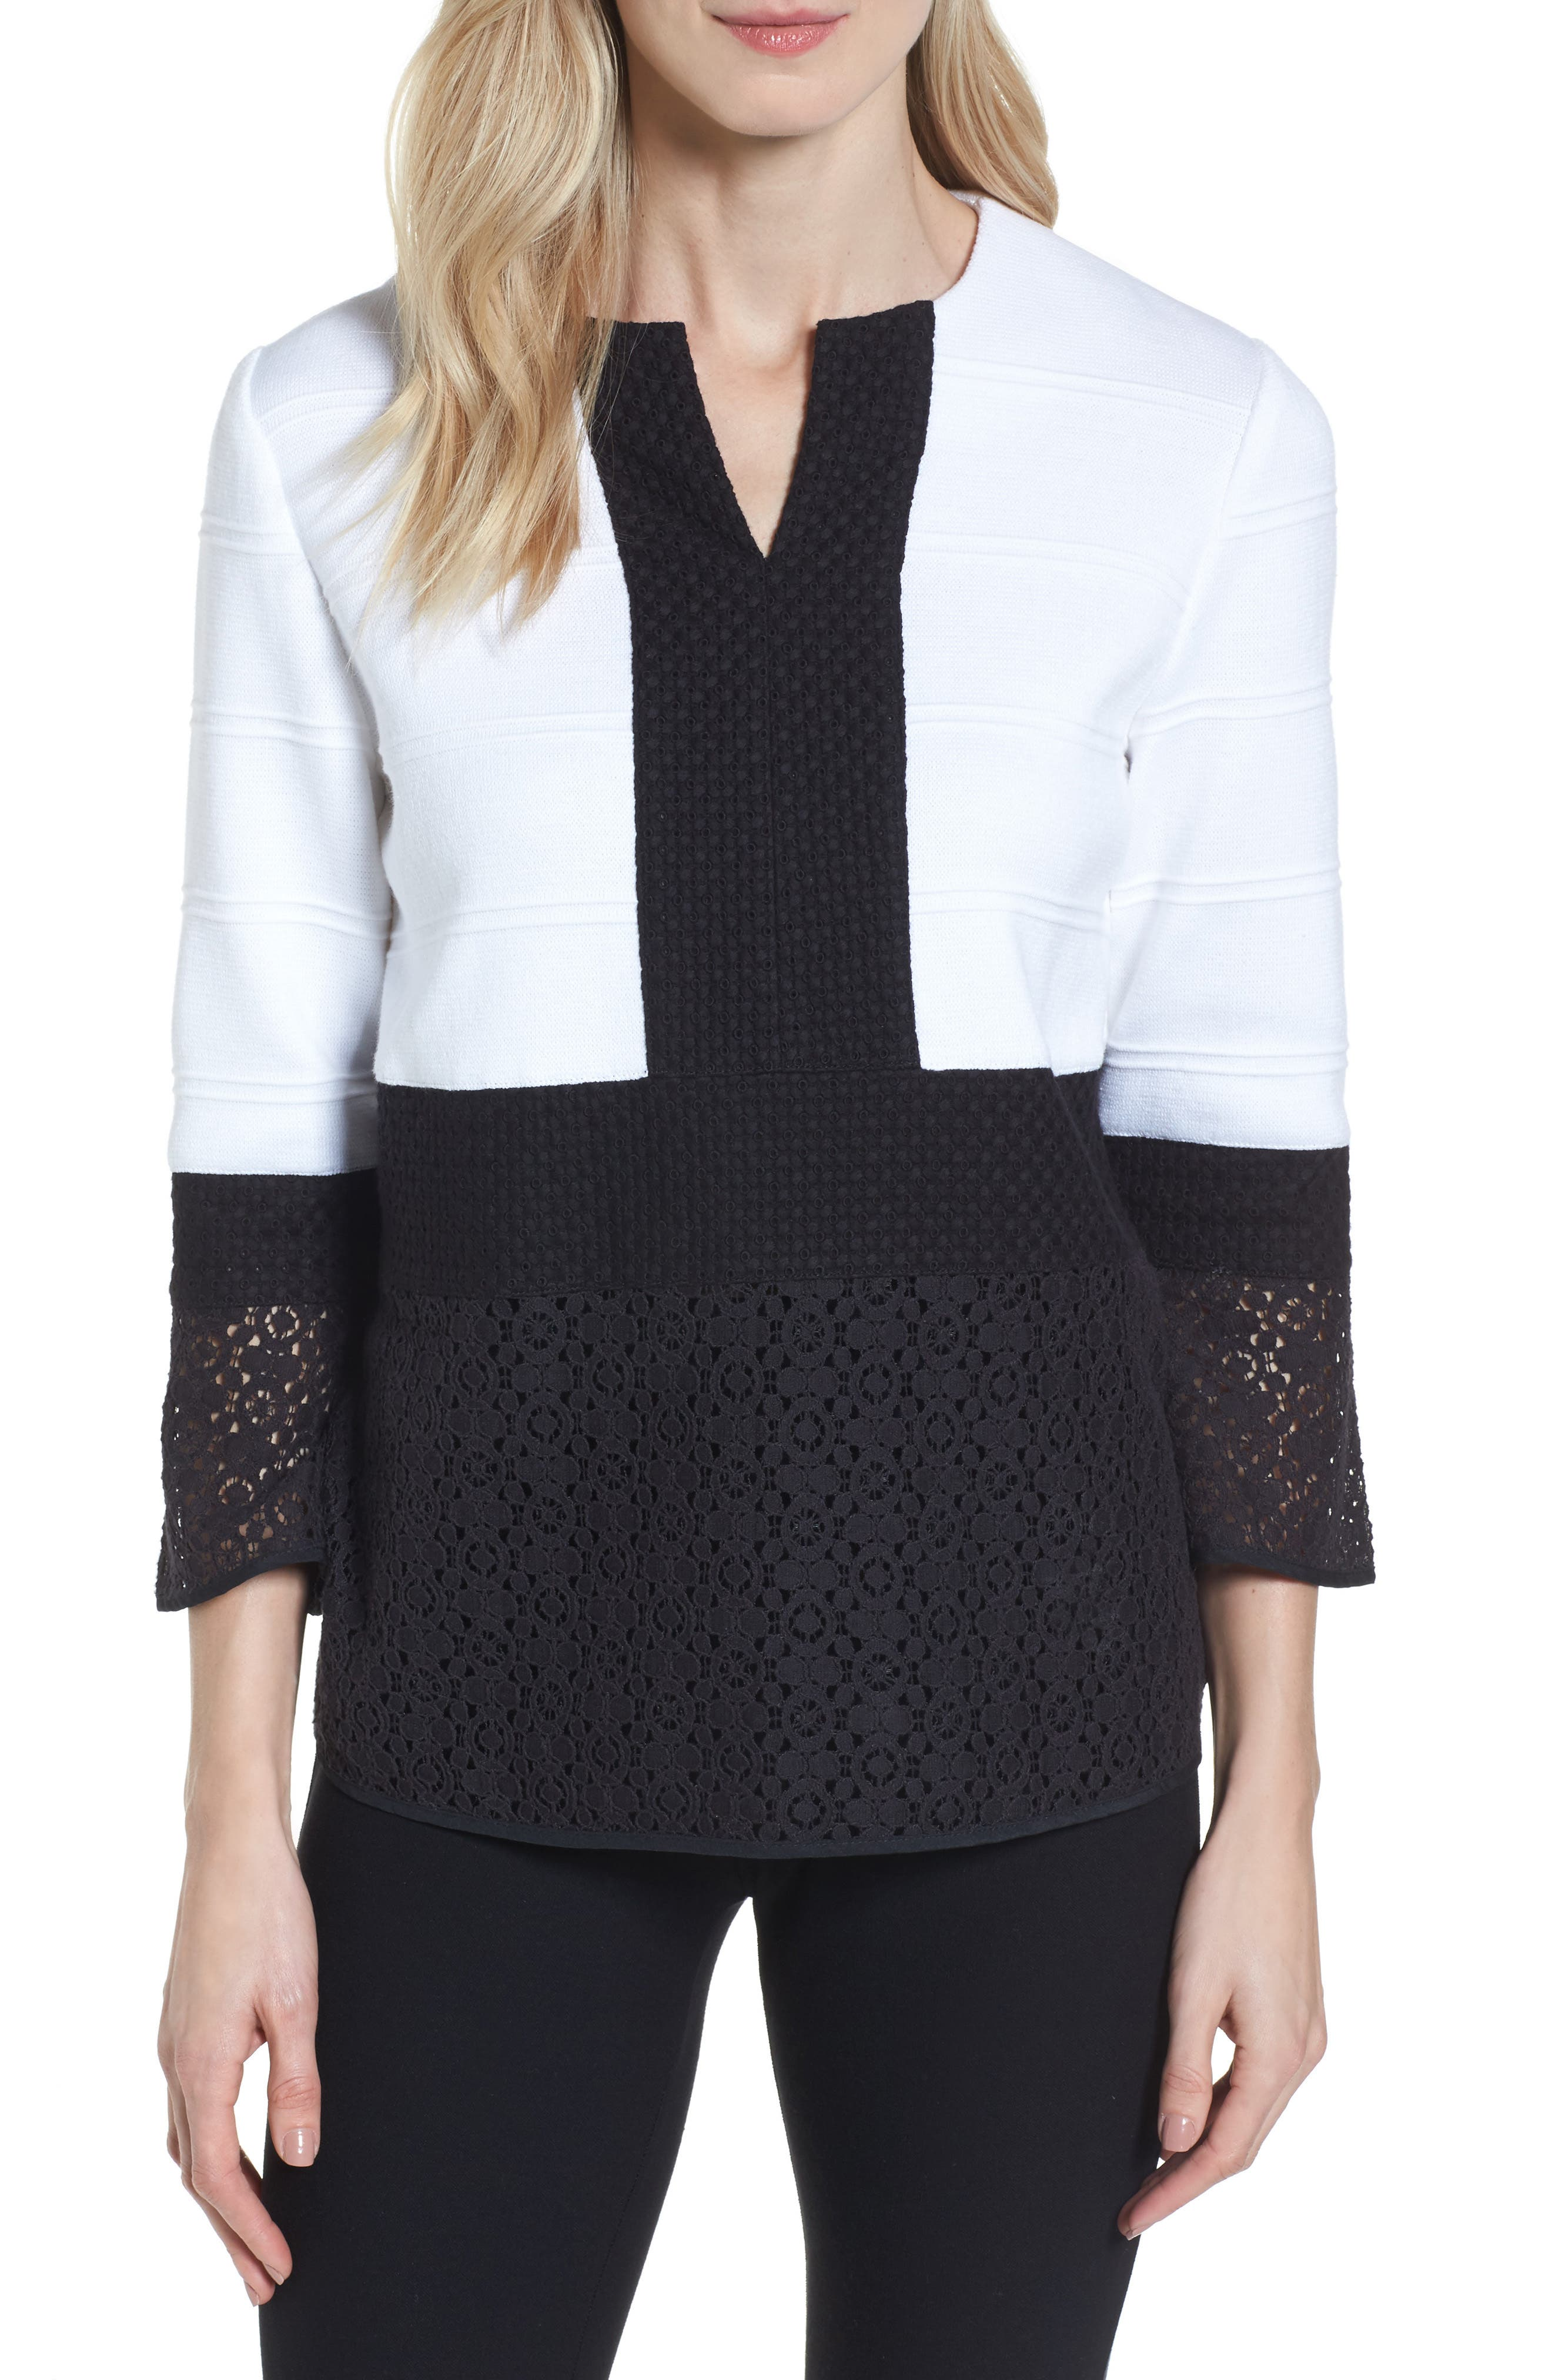 Alternate Image 1 Selected - Ming Wang Knit & Lace Tunic